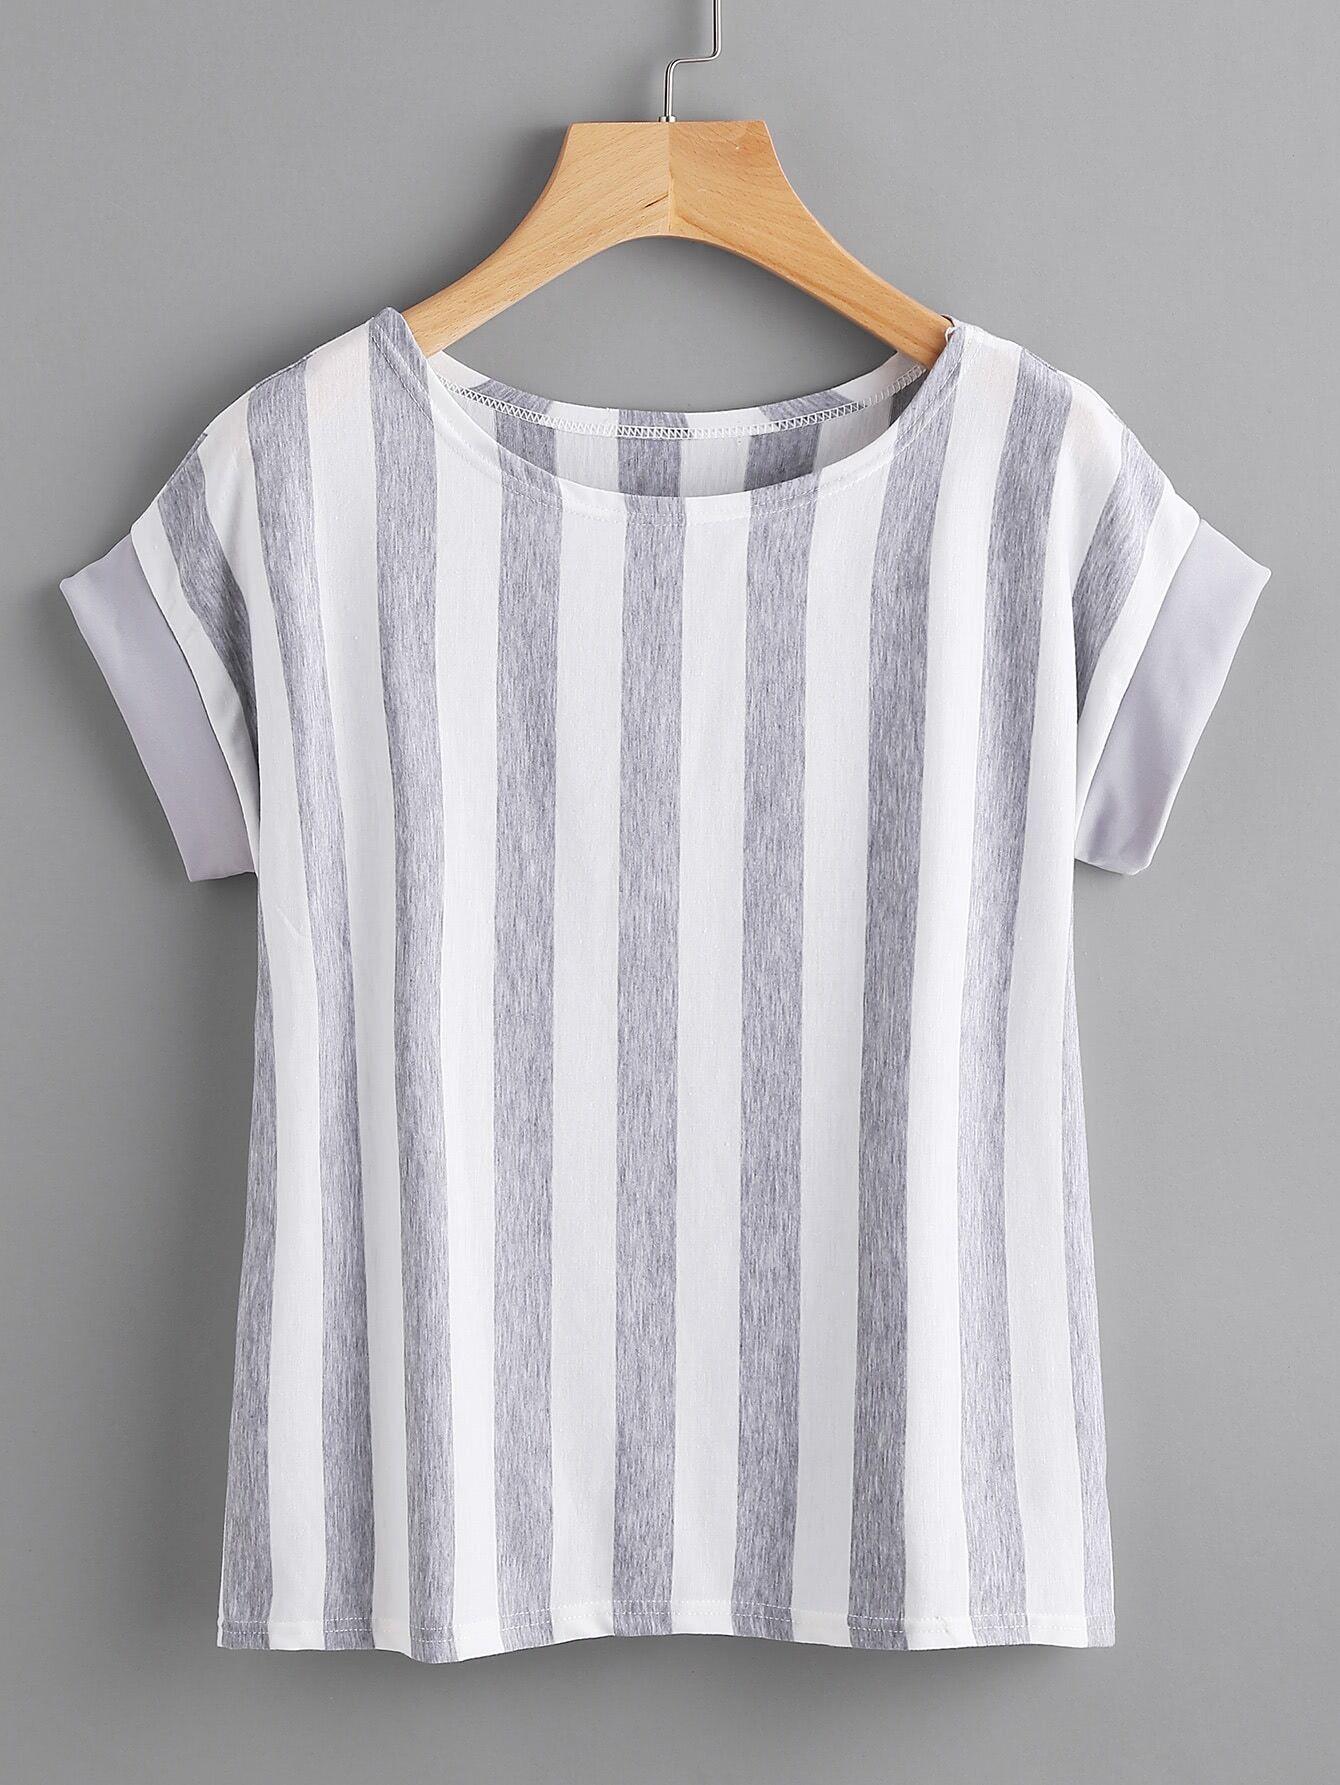 Contrast Vertical Striped T-shirt -SheIn(Sheinside)